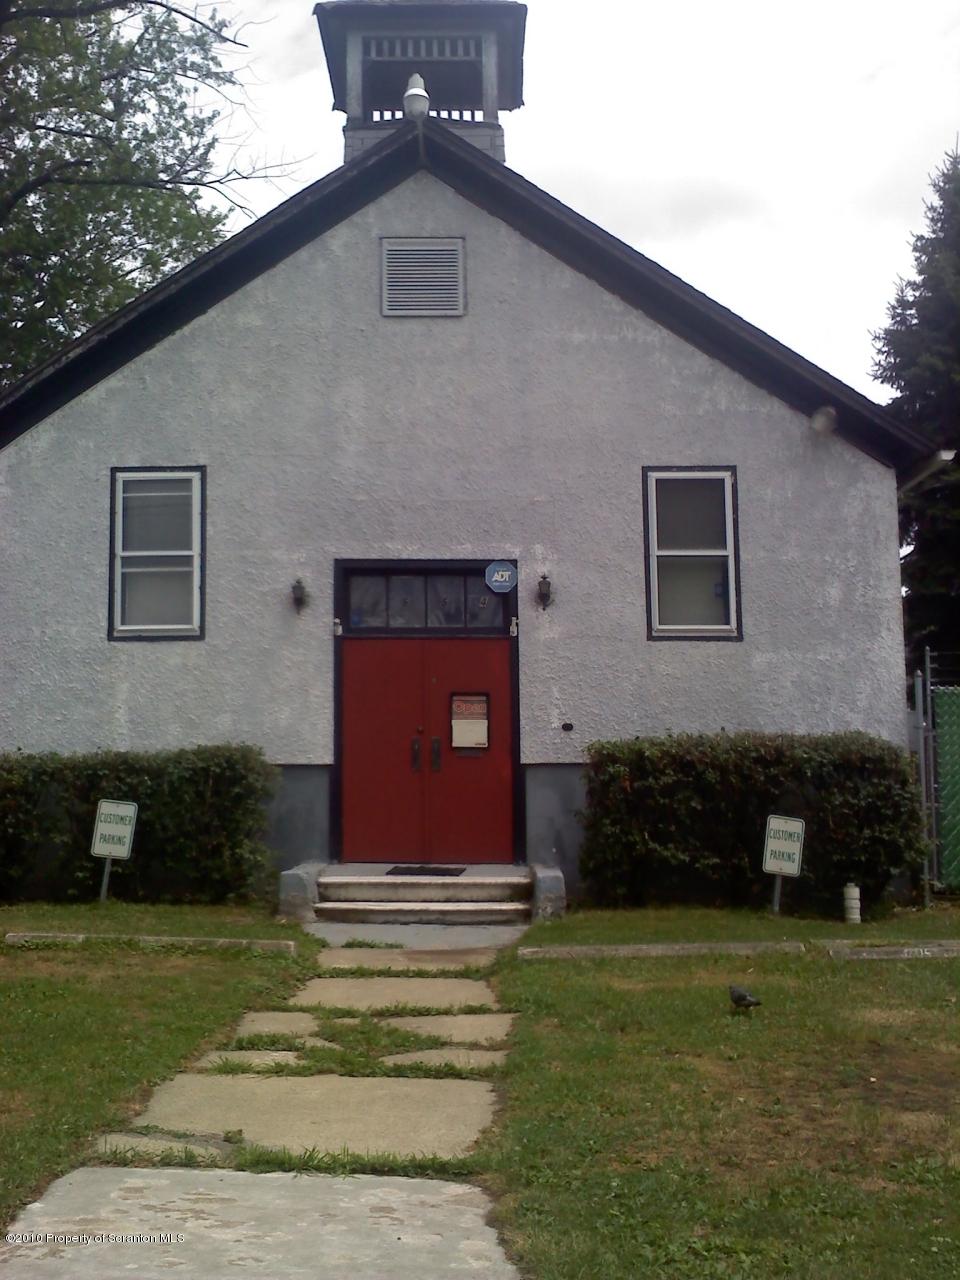 1554 GARDNER AVE, Scranton, Pennsylvania 18509, ,2 BathroomsBathrooms,Commercial,For Sale,GARDNER,10-3808